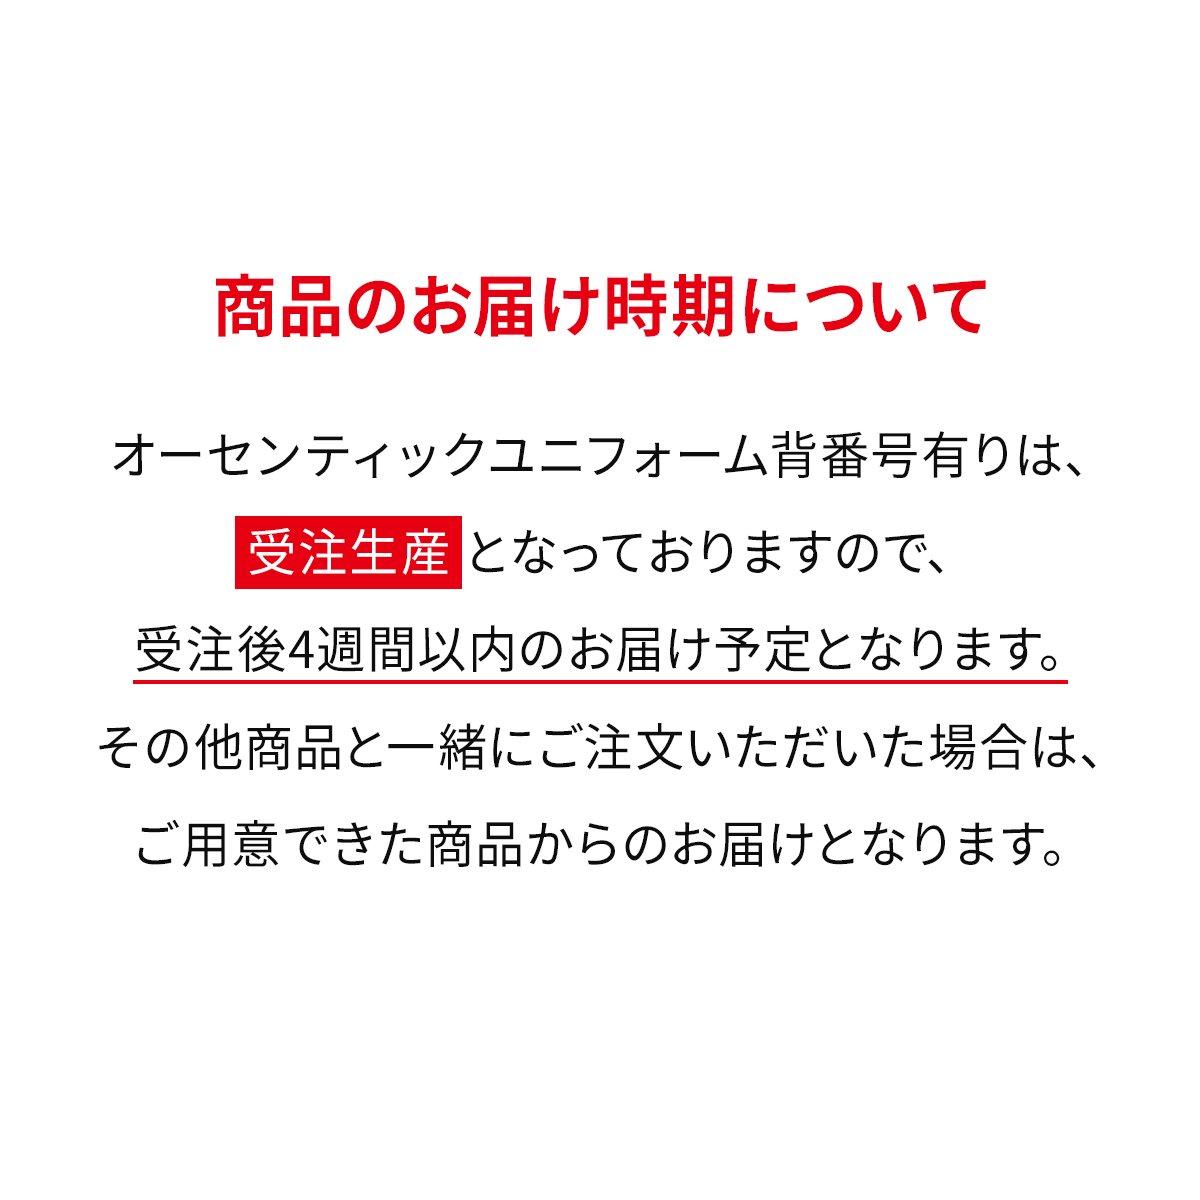 <img class='new_mark_img1' src='https://img.shop-pro.jp/img/new/icons8.gif' style='border:none;display:inline;margin:0px;padding:0px;width:auto;' />沖縄SV(OSV) 2020 オーセンティックユニフォーム GK2nd